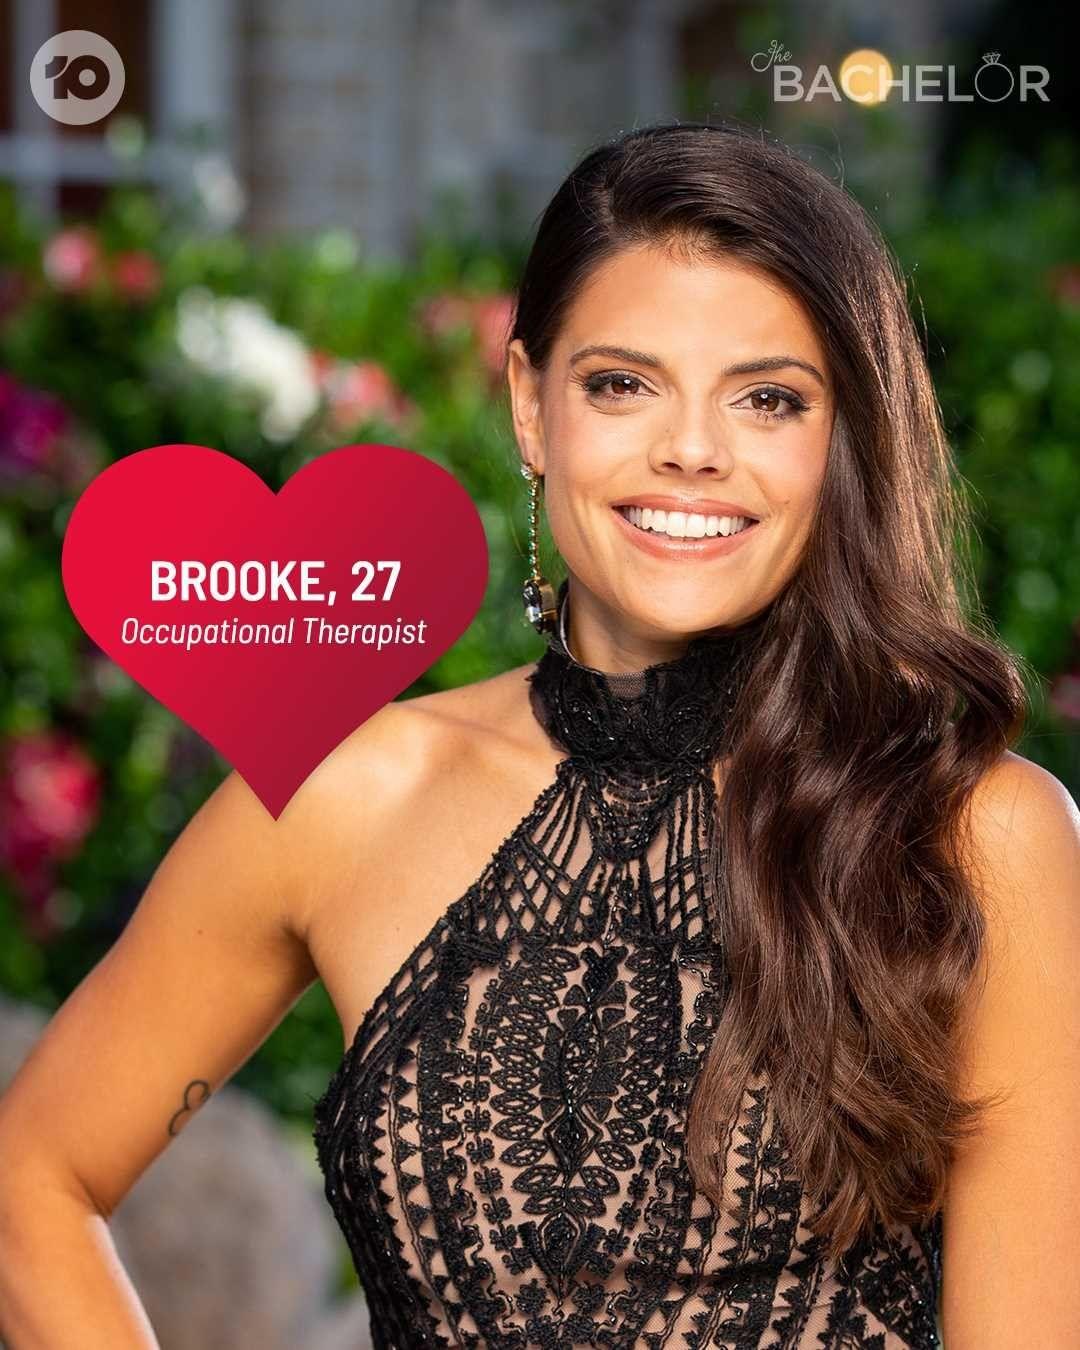 Bachelor Australia - Season 9 - Jimmy Nicholson - Brooke Cleal - **Sleuthing Spoilers** 21437210